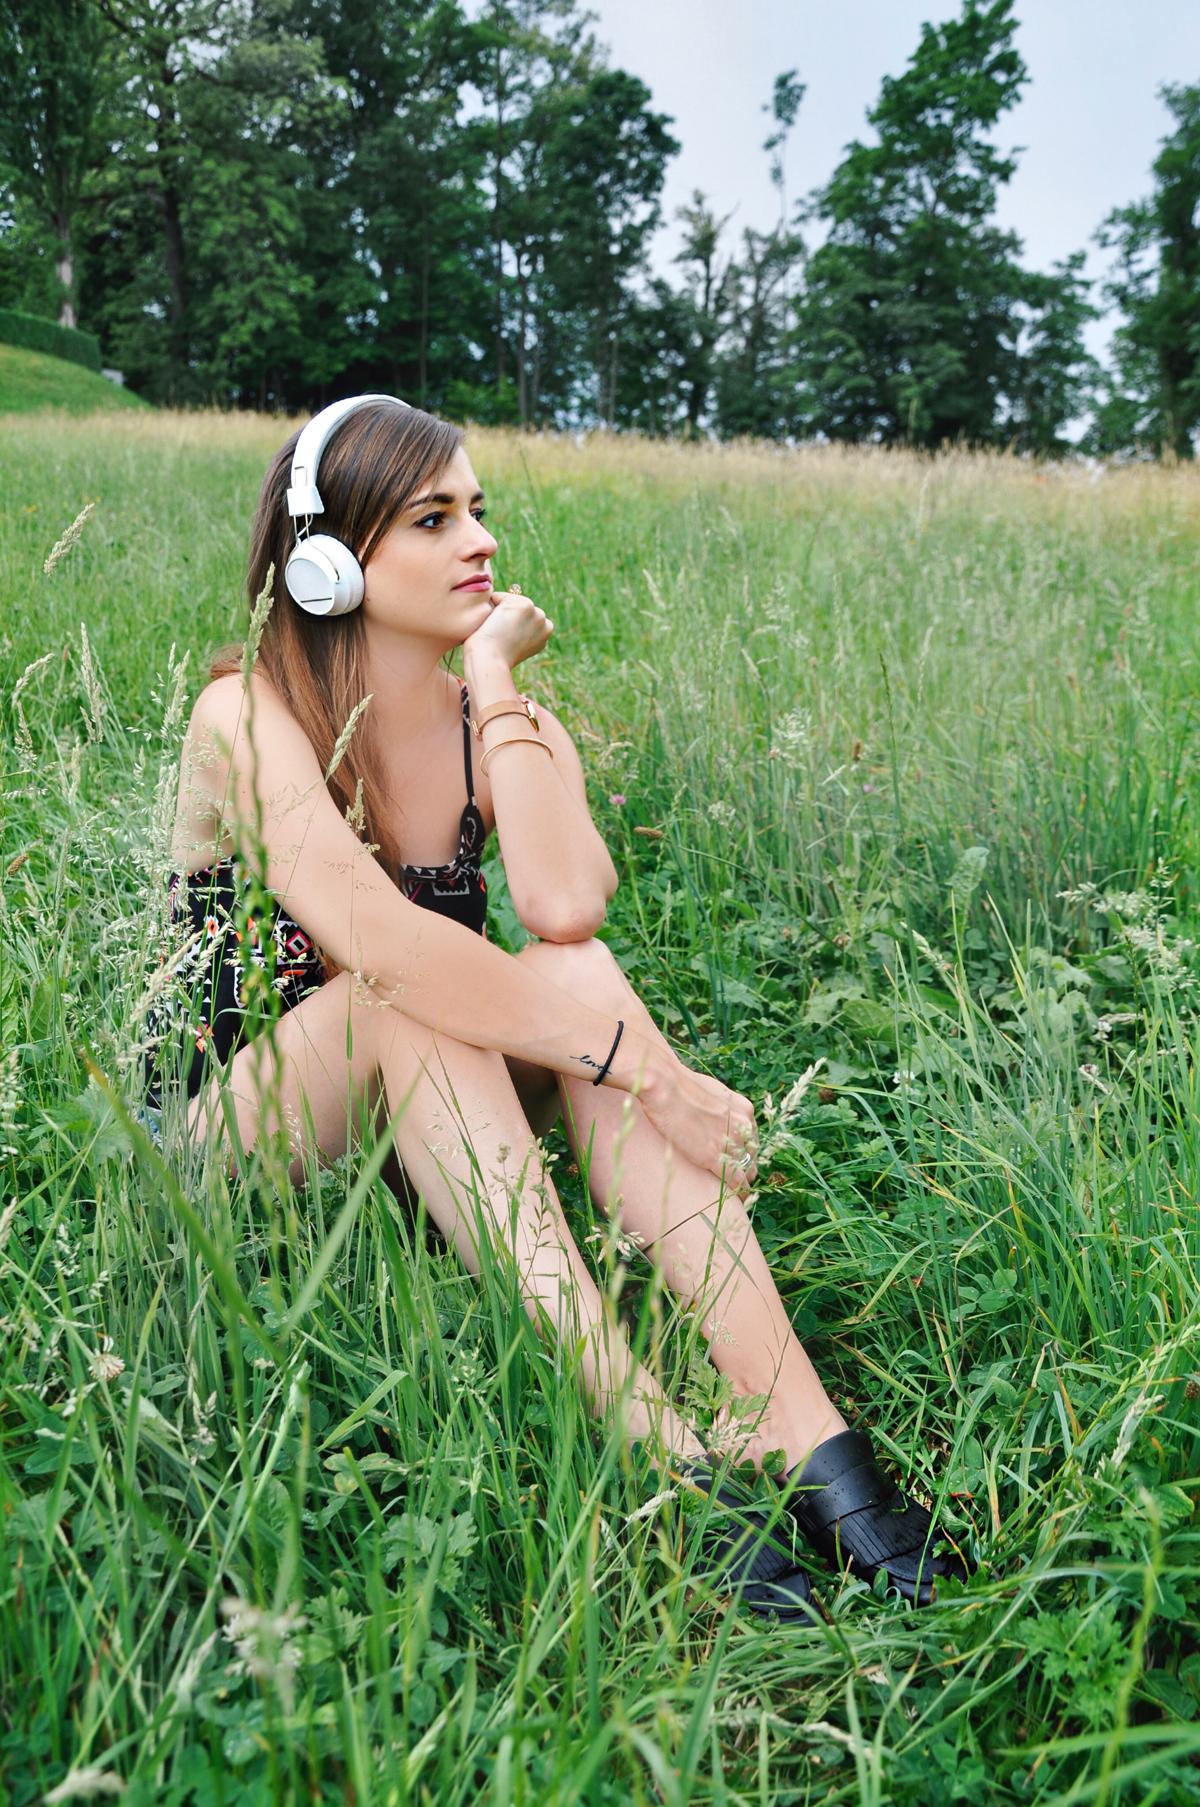 Fasionblogger, Andrea Steiner from Strawberries 'n' Champagne wear Regen On-Ear Headphones by Sudio.